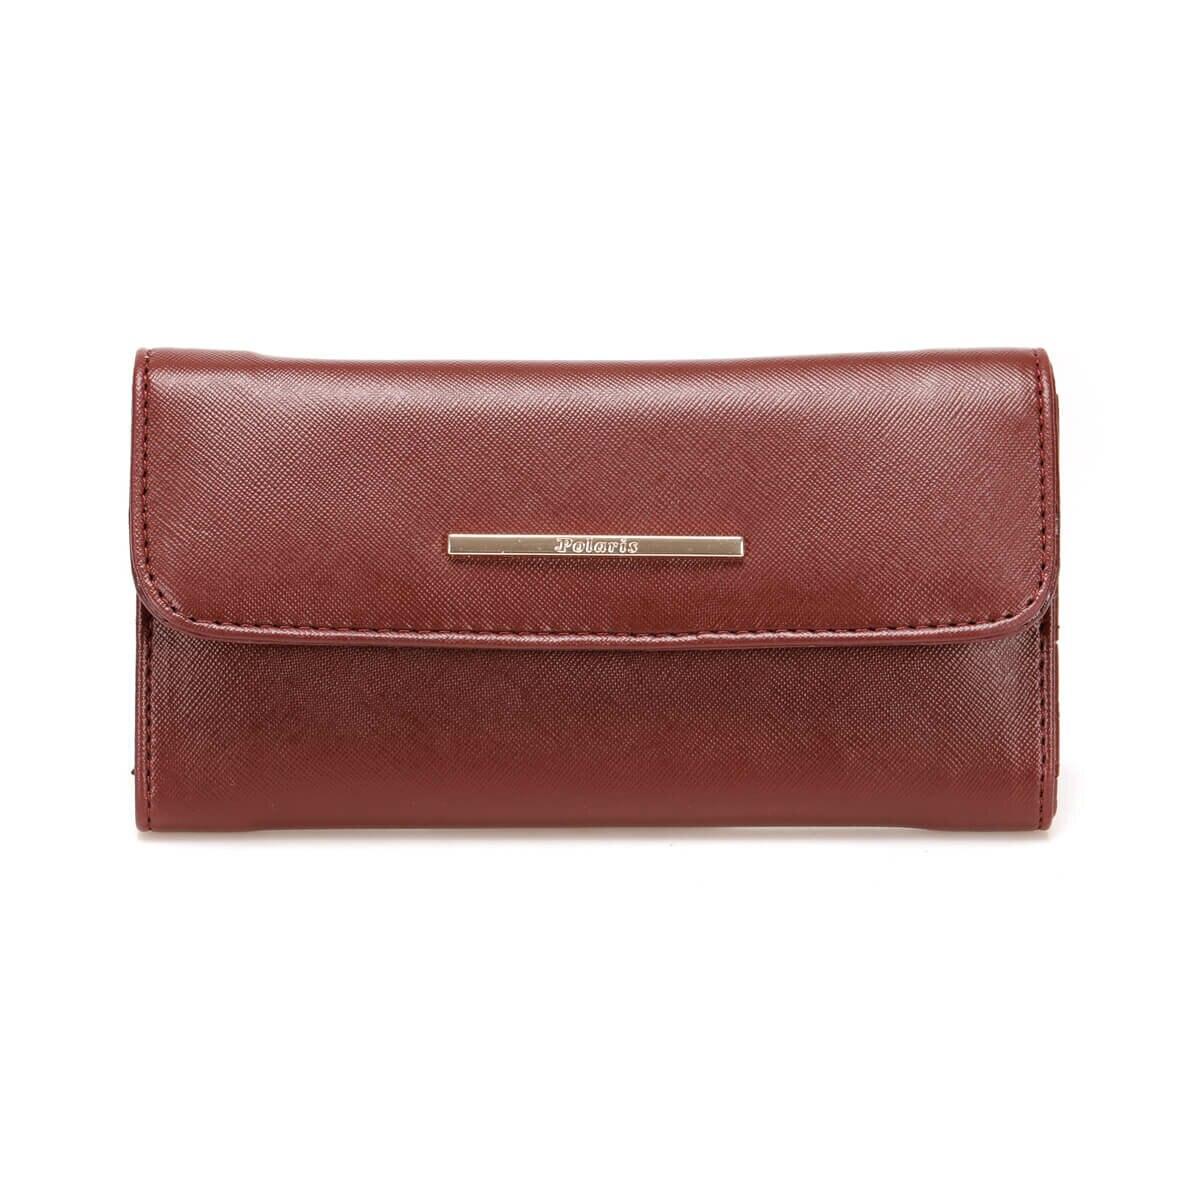 FLO Women Walllet Burgundy Fashion Female Wallet Small Hand Money Bag Женский кошелек 91.968.007.D Polaris